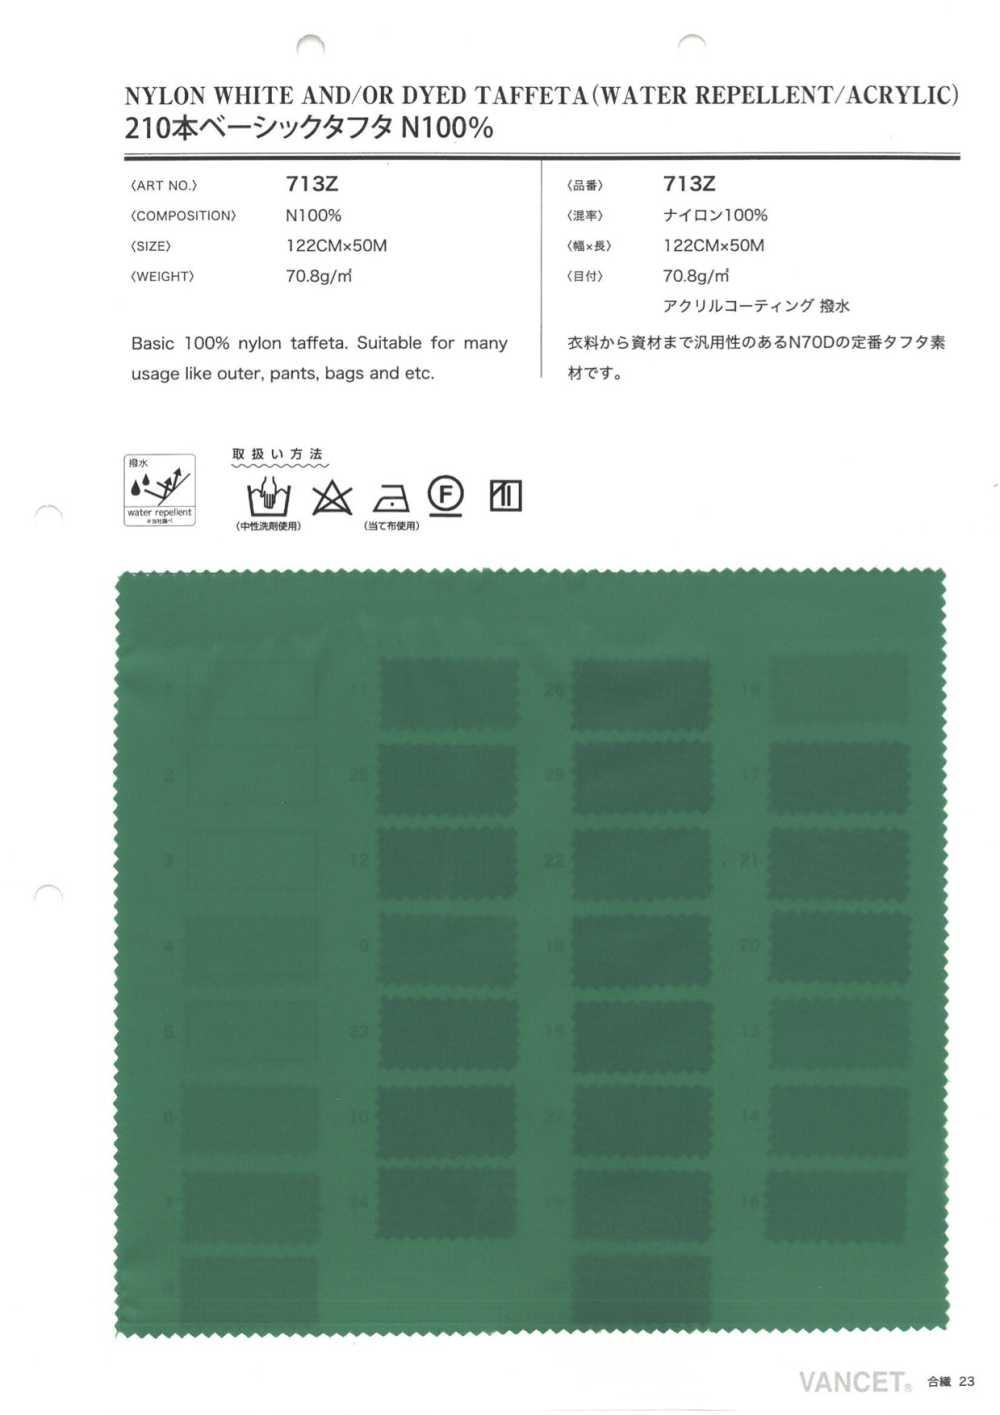 713Z 210本ベーシックタフタ[生地] VANCET/オークラ商事 - ApparelX アパレル資材卸通販